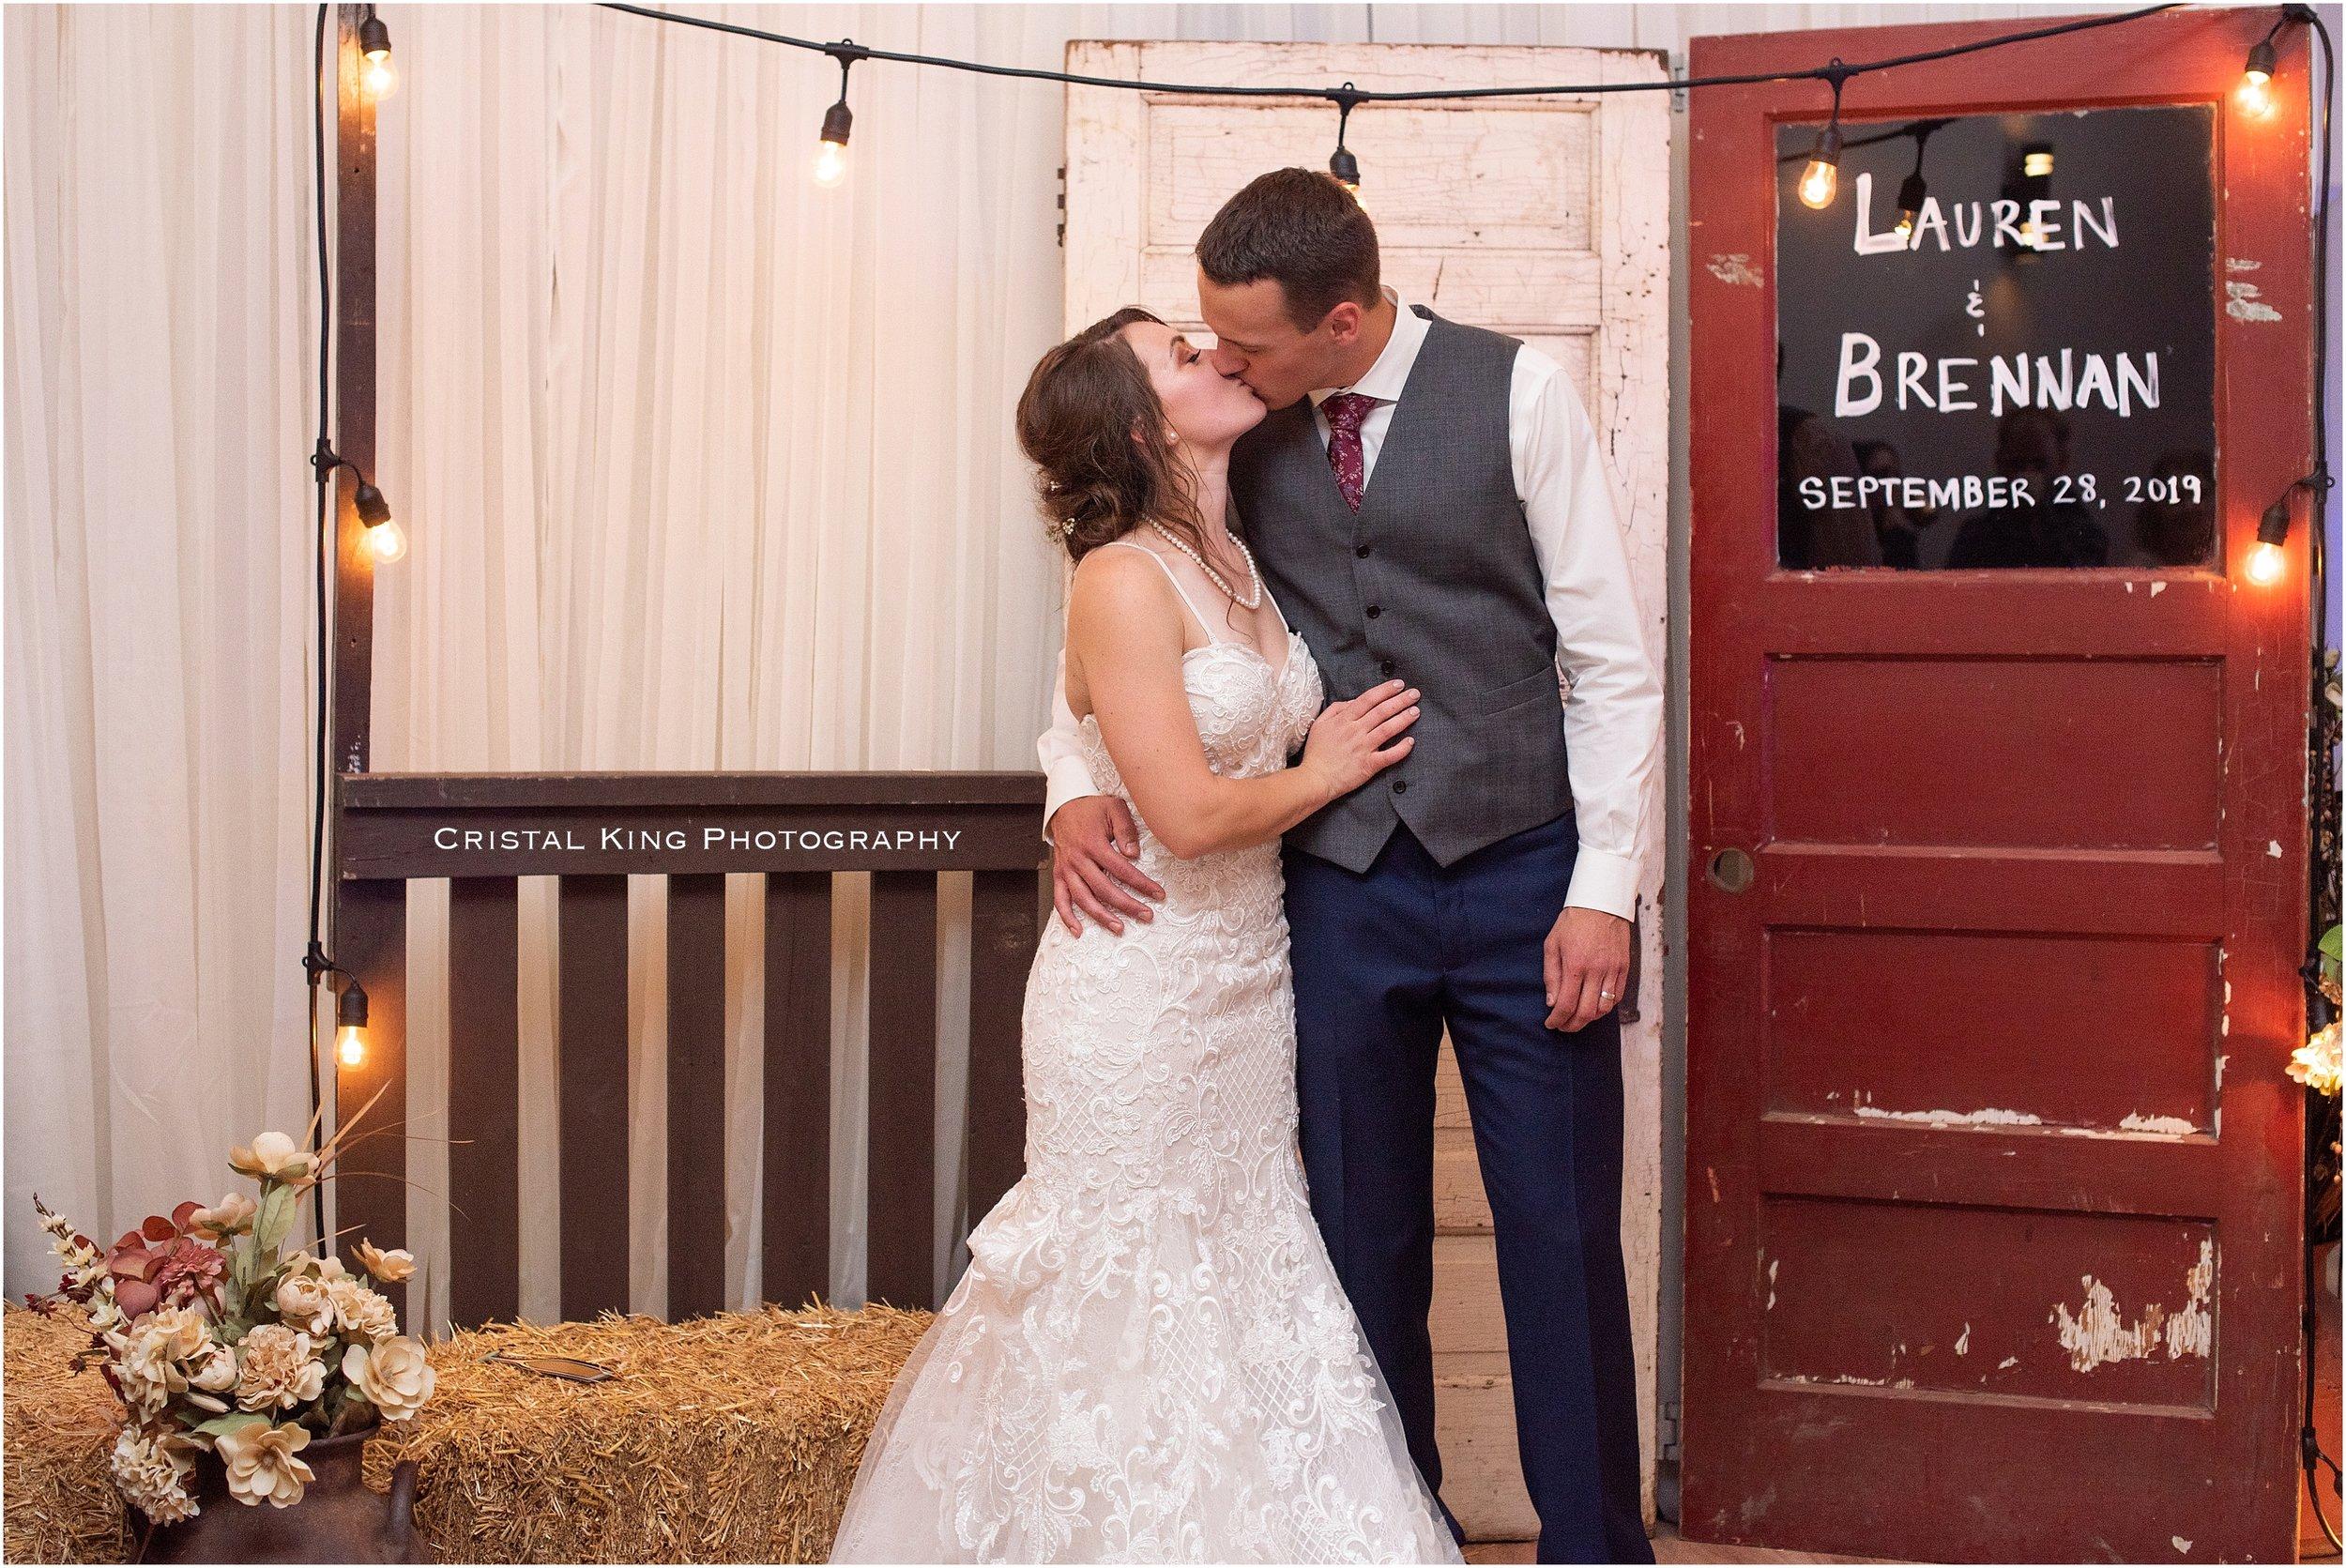 Lauren & Brennan's Wedding-200.jpg